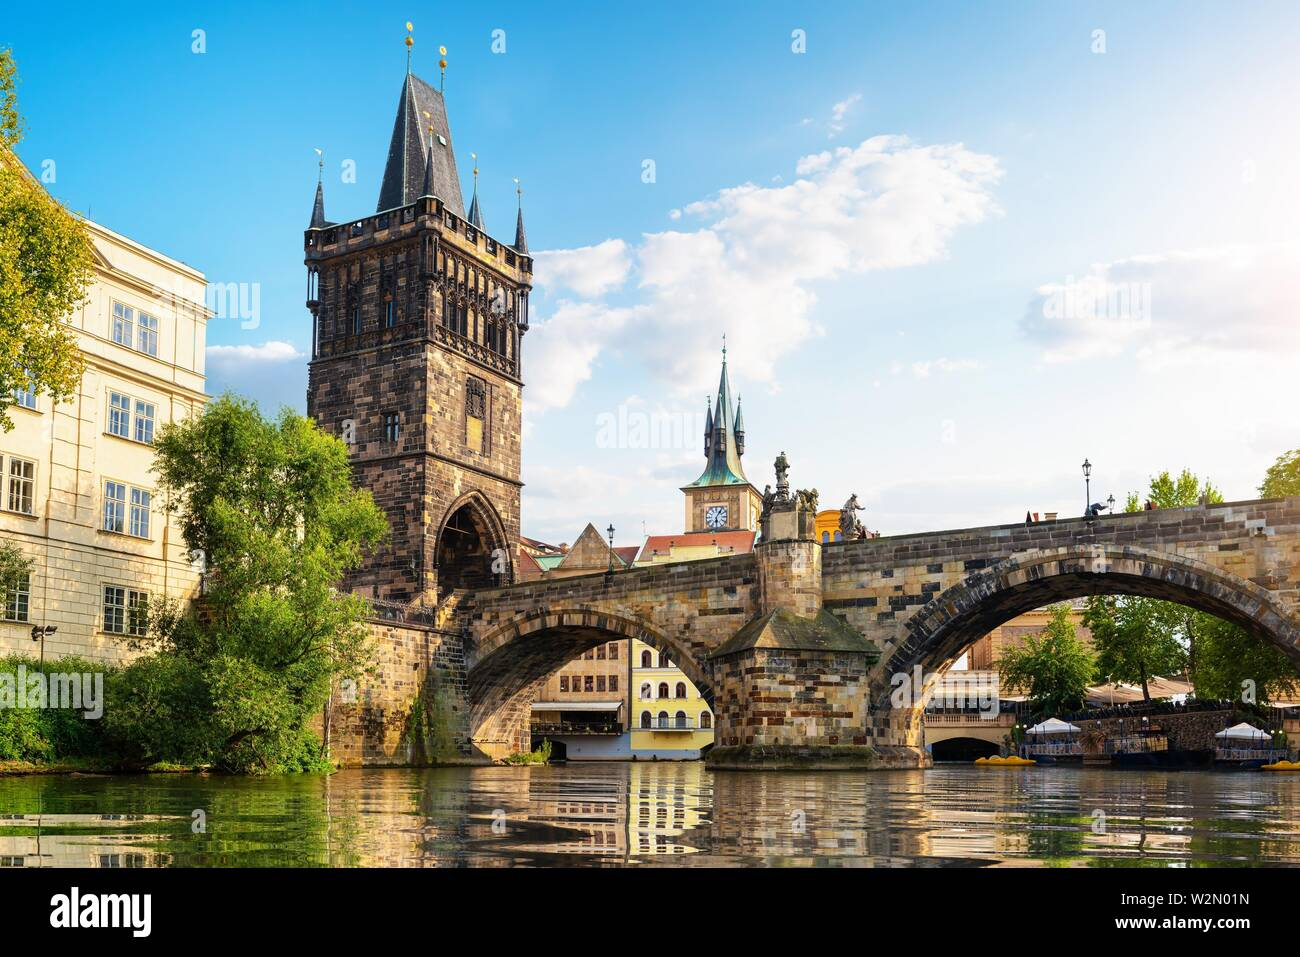 Tha Charles Bridge in Prague at summer day. - Stock Image